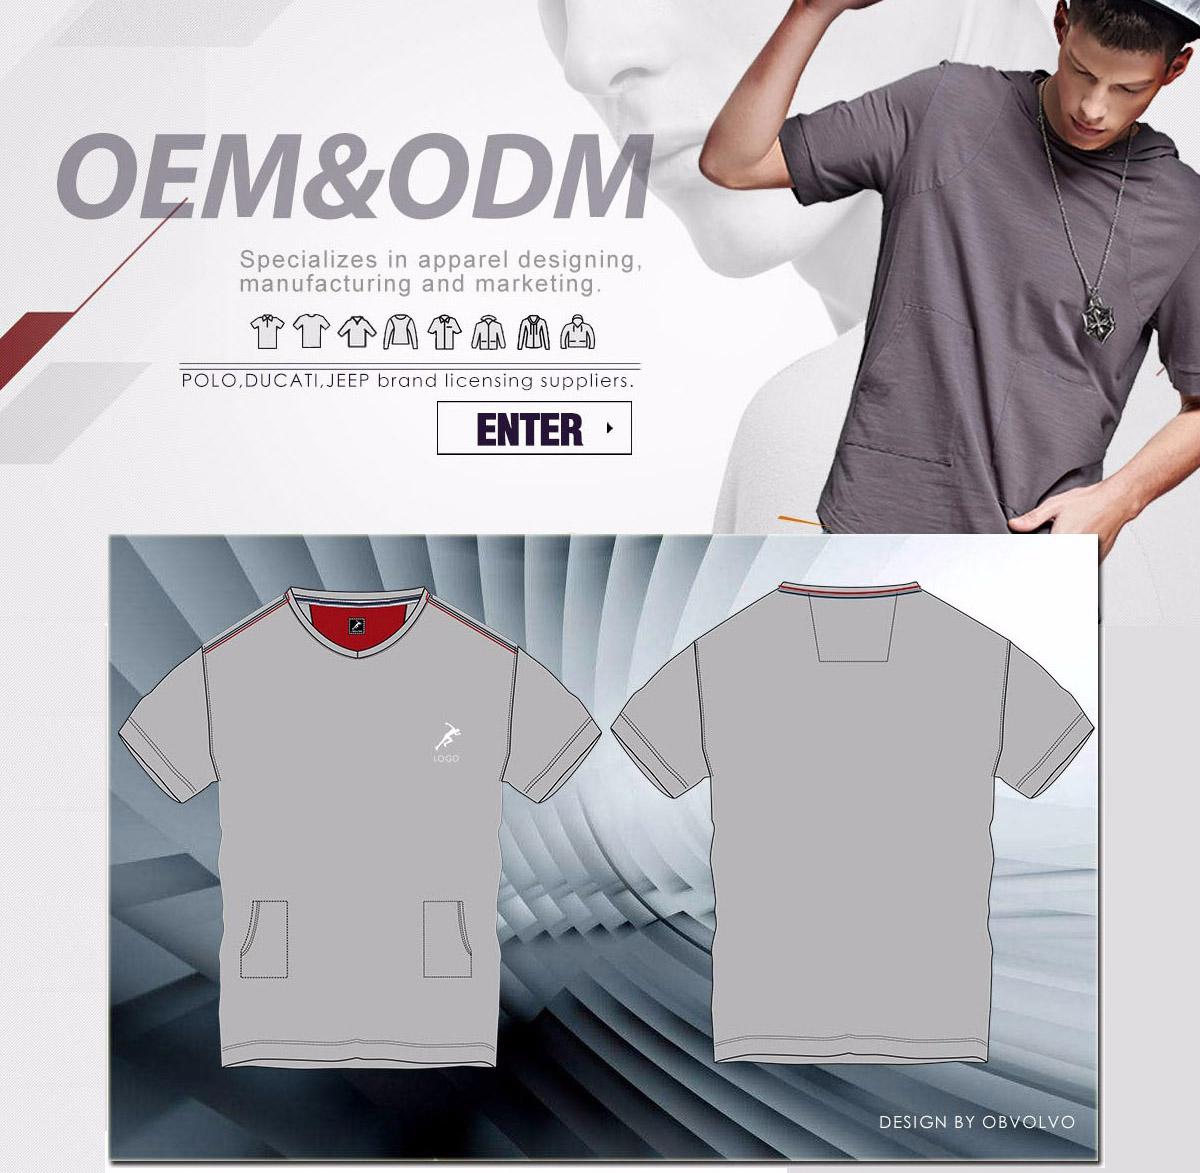 Shenzhen Wenx Garment Co Ltd T Shirts Polo Kaos Pria Lengan Pendek Cabanna Black Floral Shirt